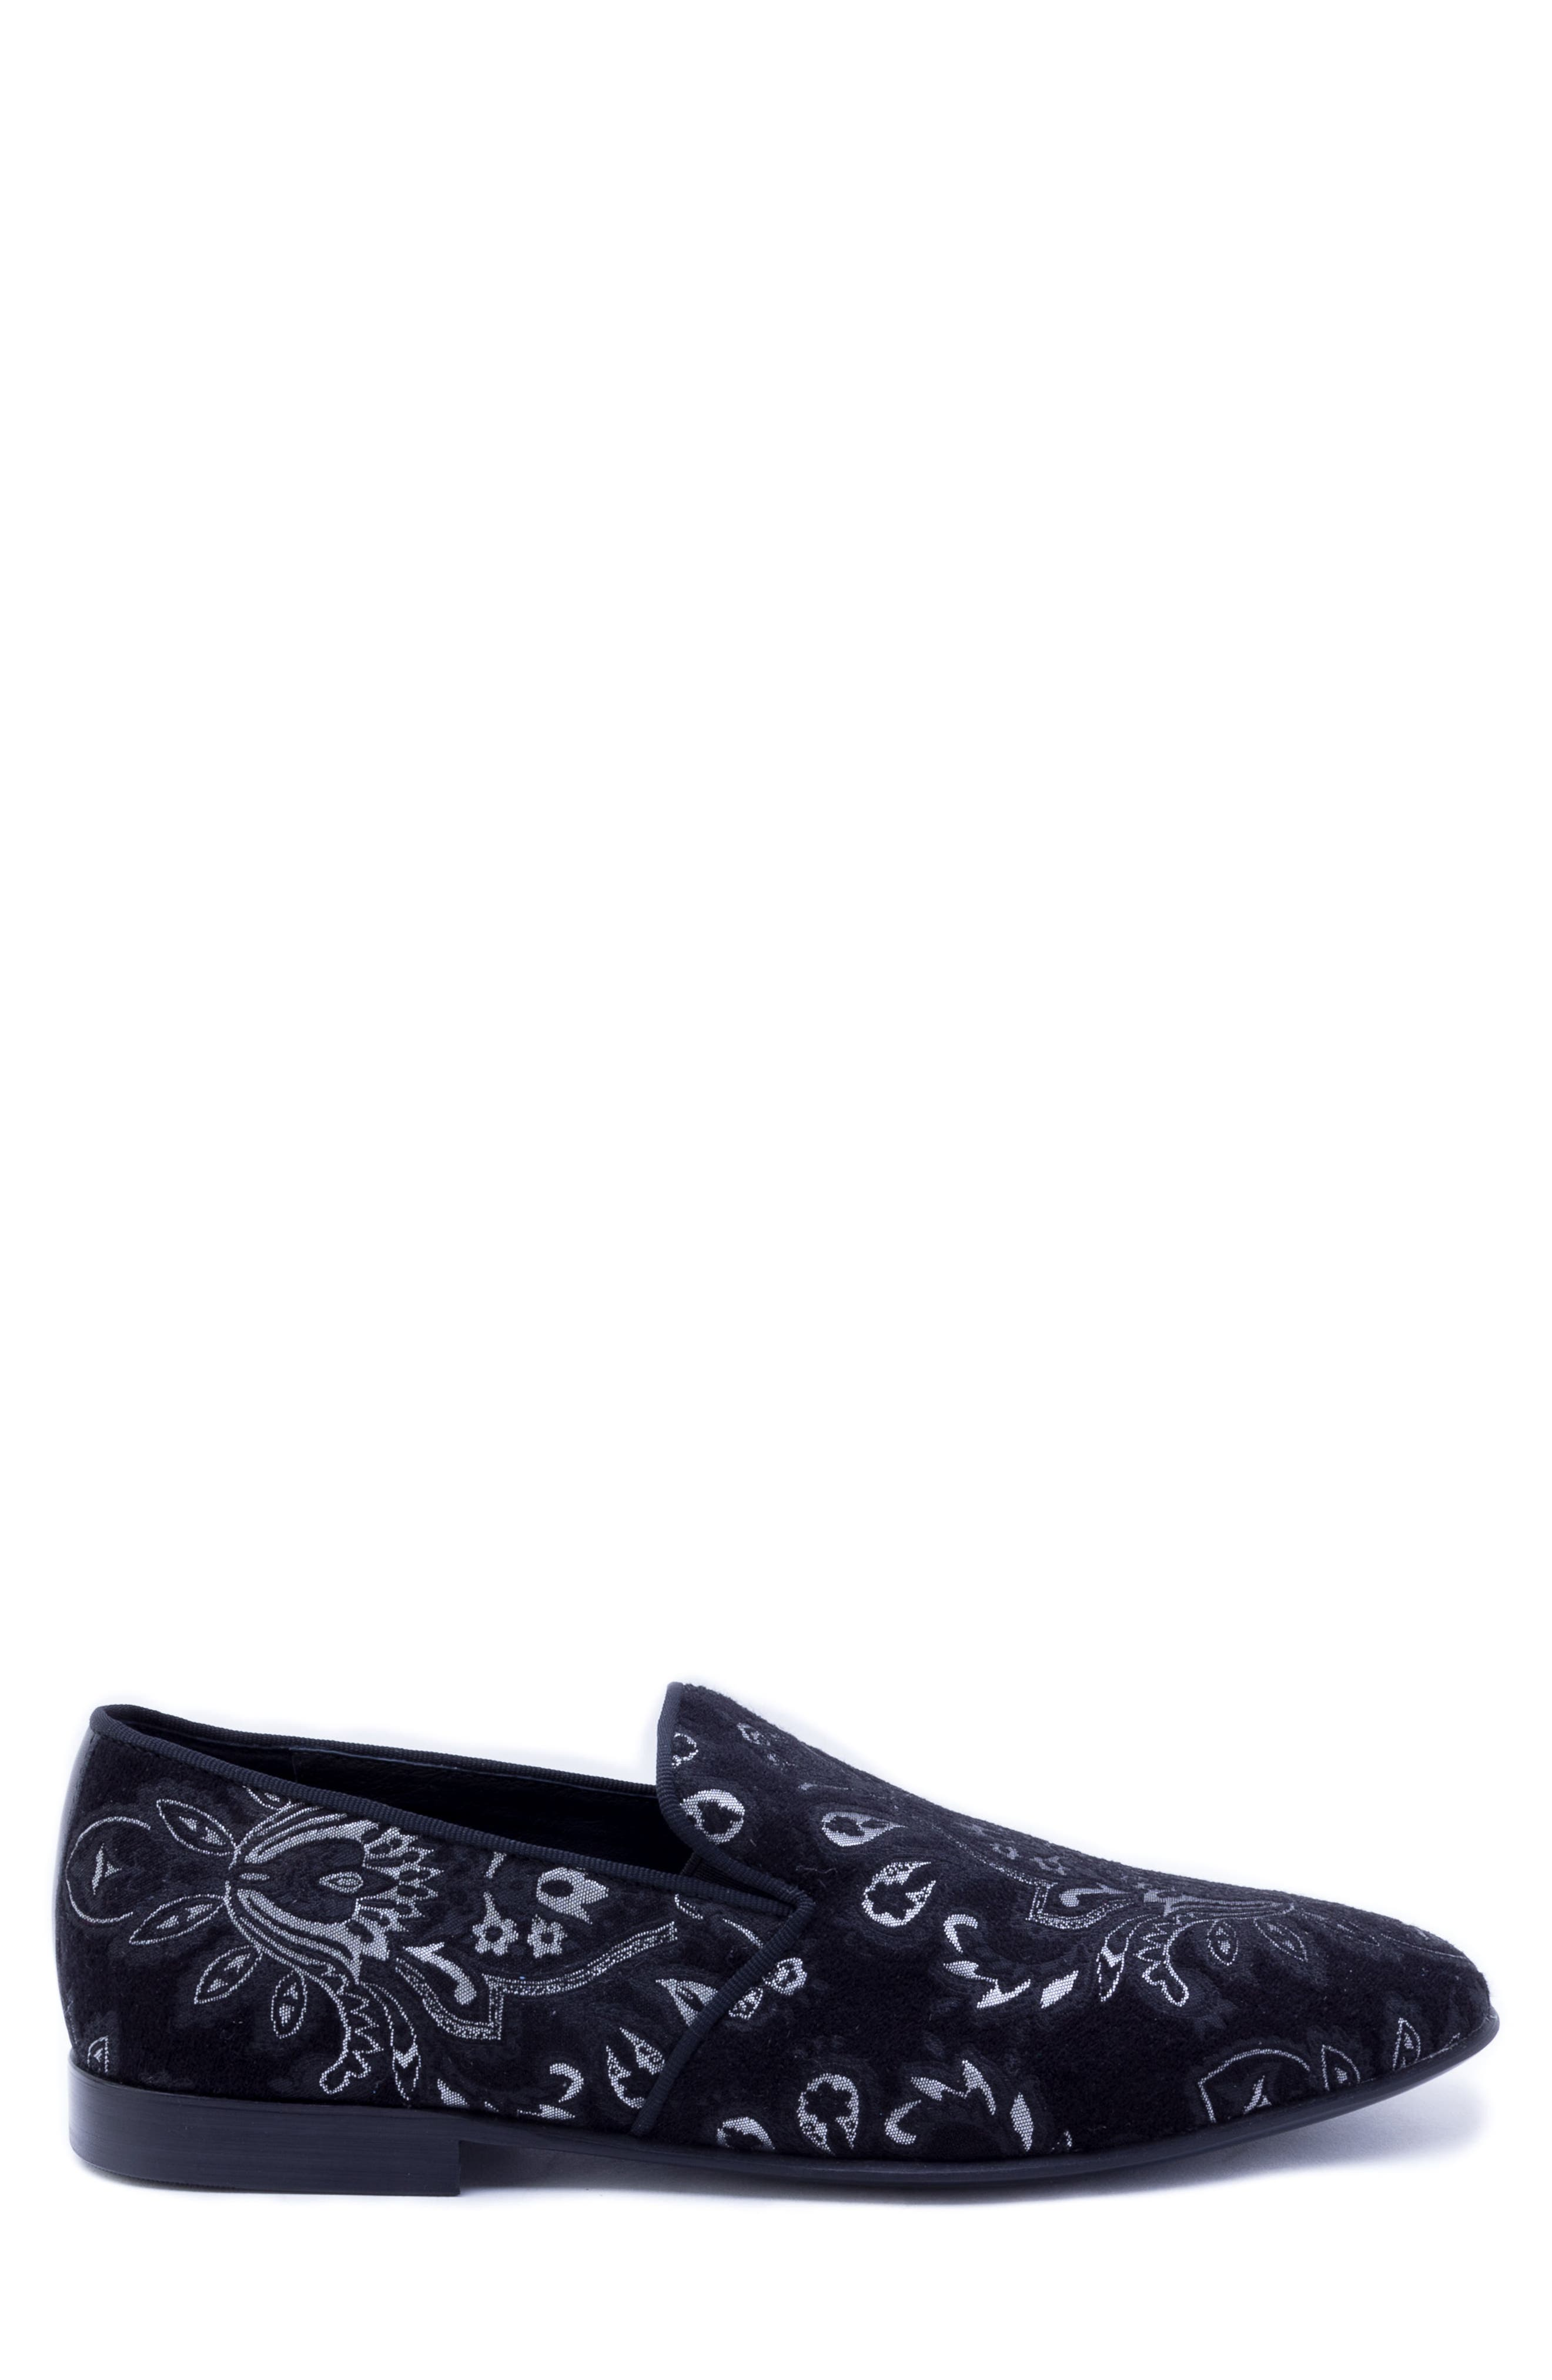 Peck Venetian Loafer,                             Alternate thumbnail 3, color,                             BLACK FABRIC